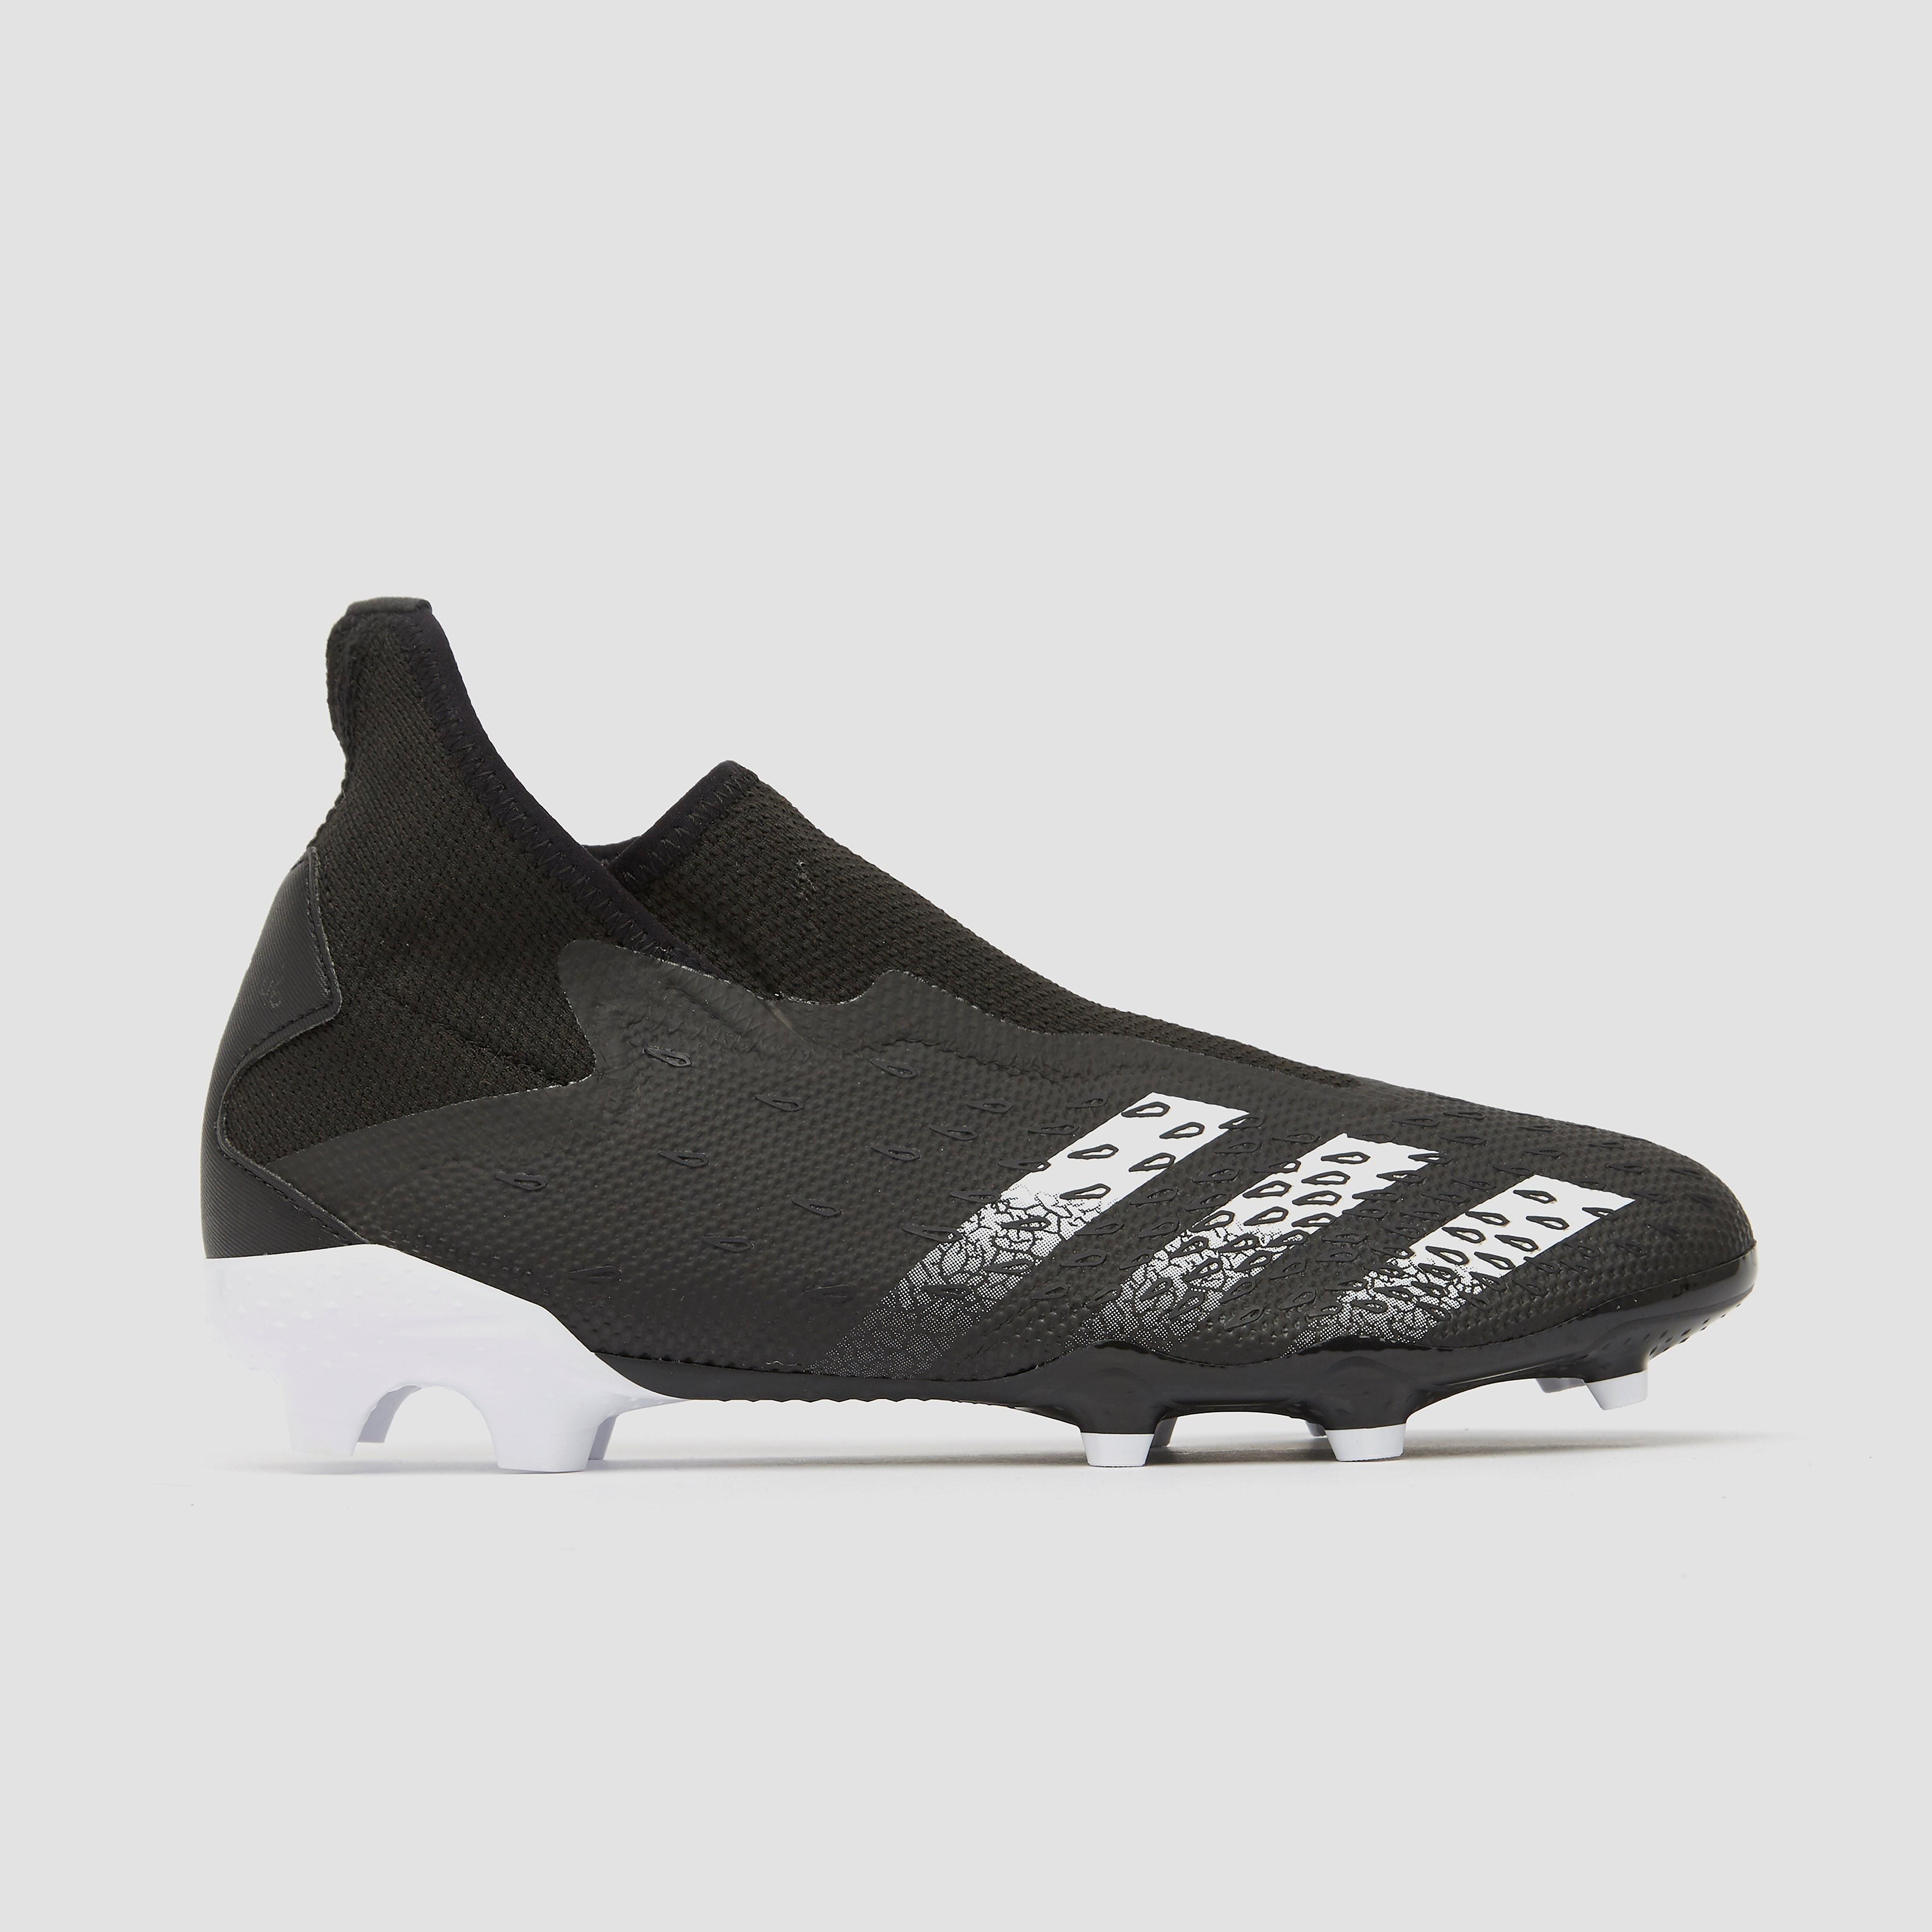 Adidas Predator freak.3 laceless fg voetbalschoenen zwart Dames